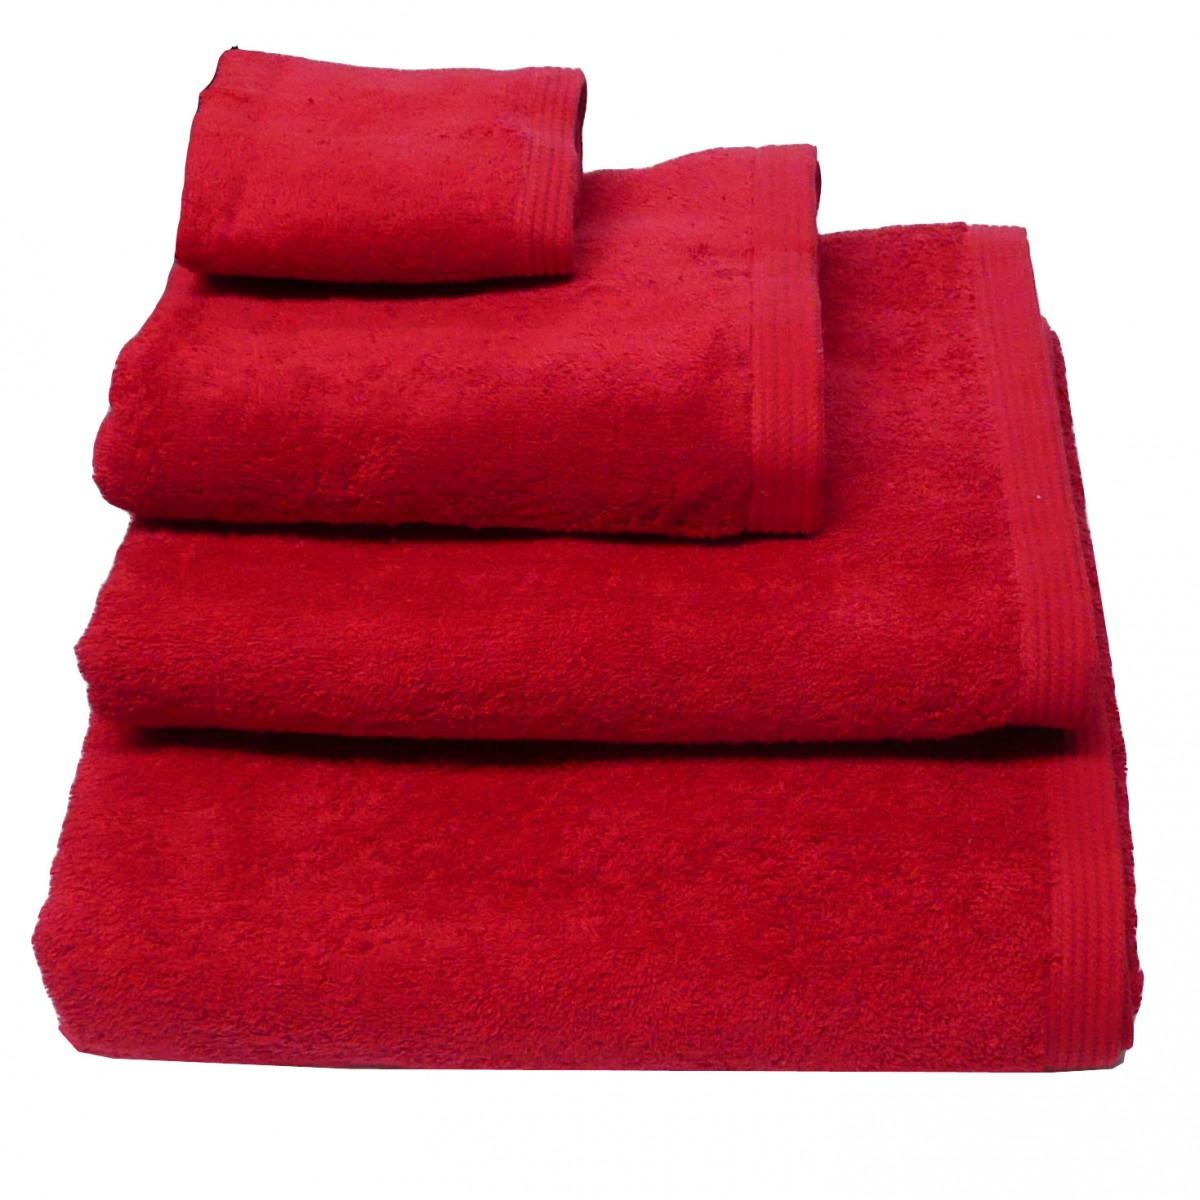 Premium-Frottee Handtuch Duschtuch Gästetuch Rot 580g/qm